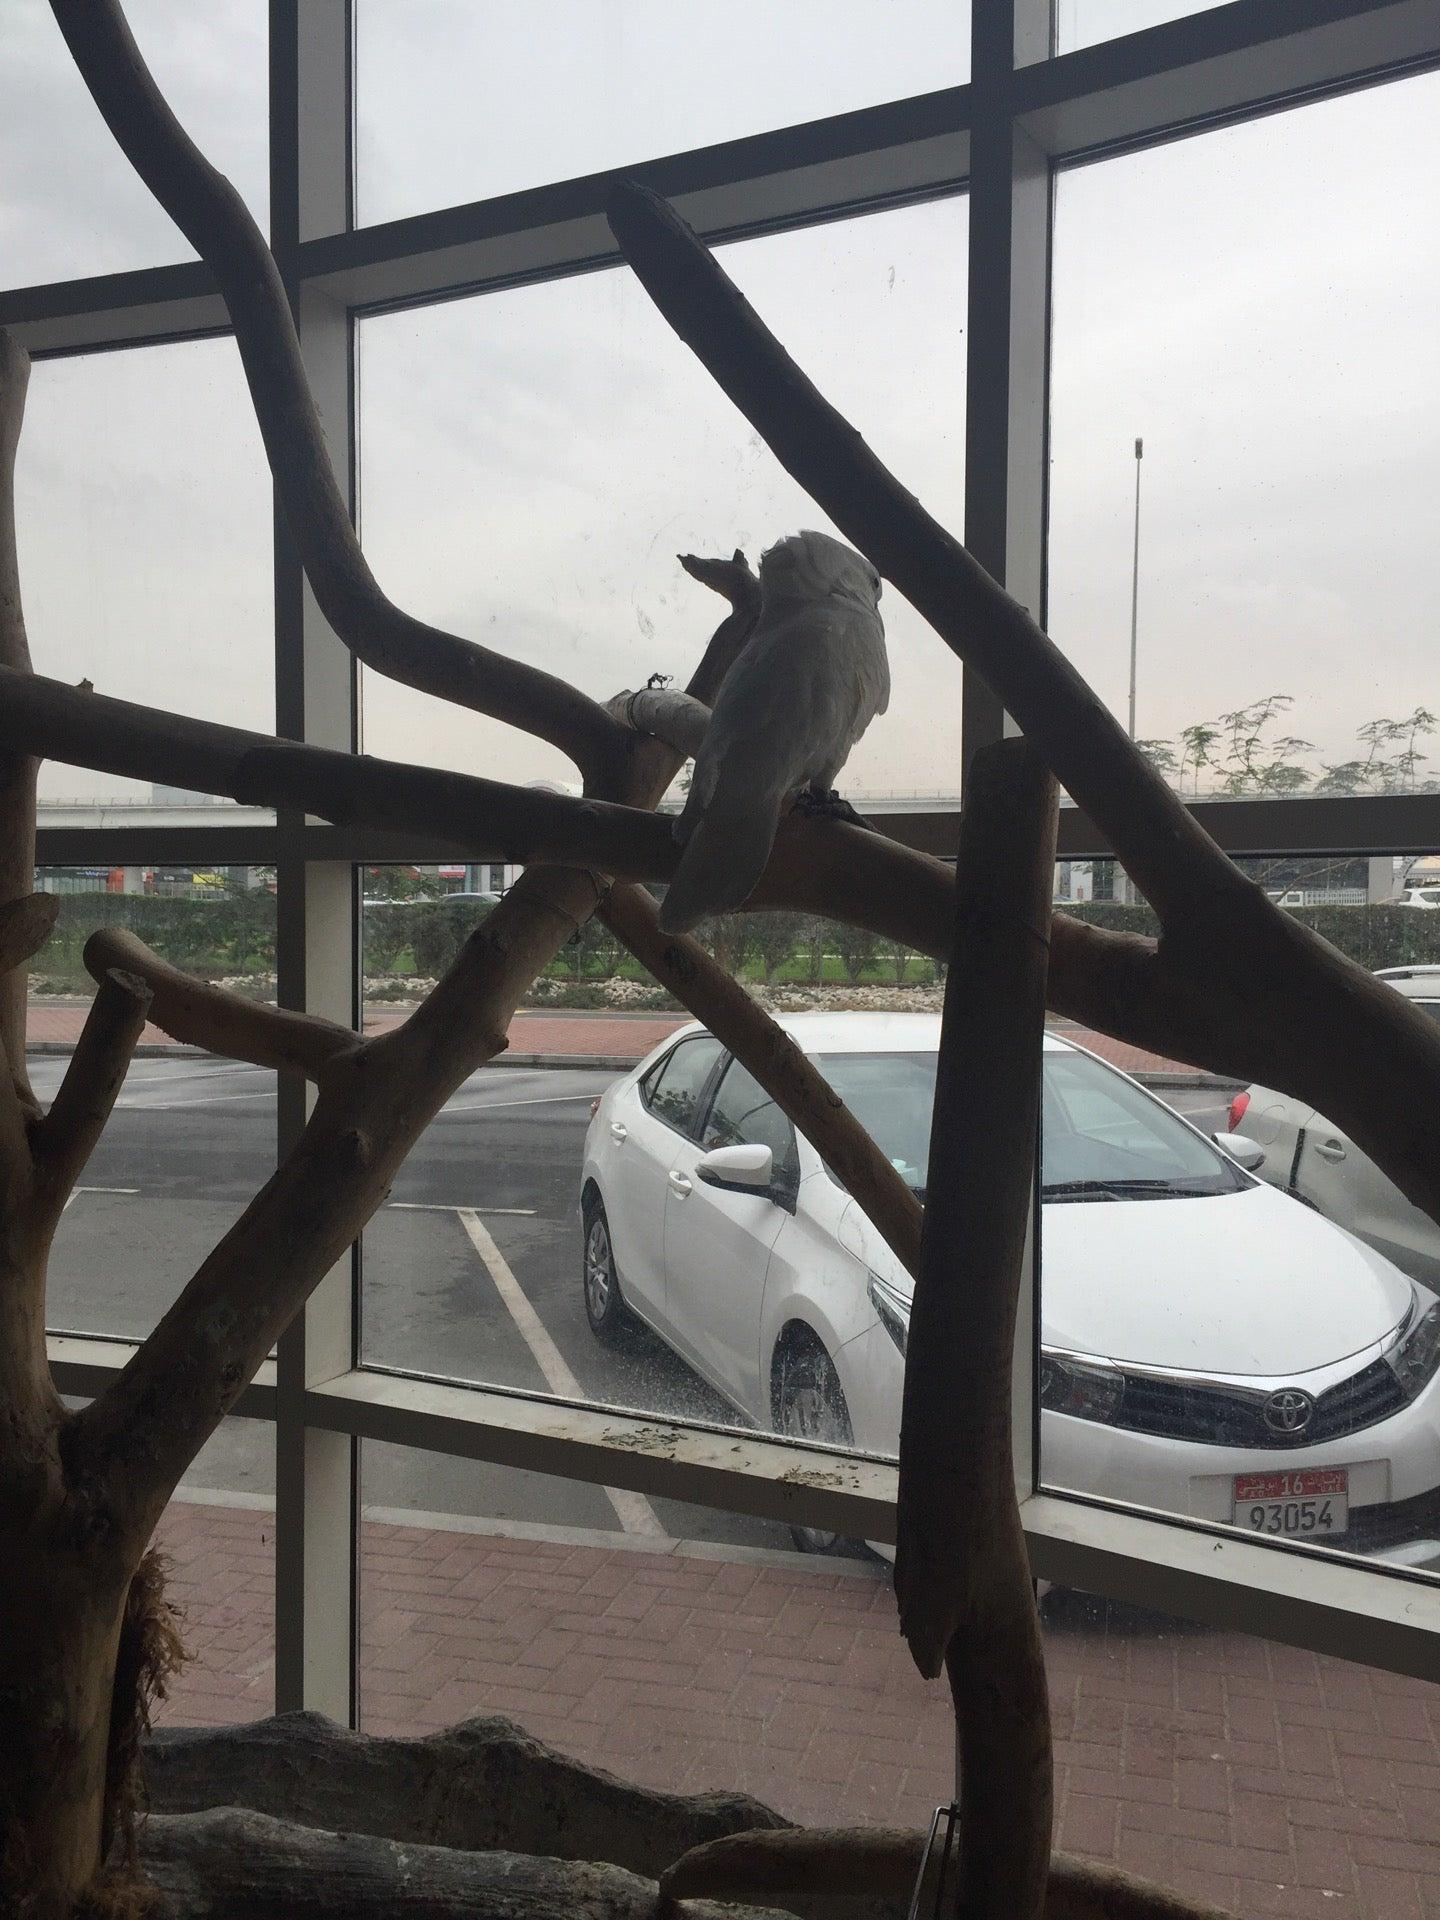 Pets Plus Mercato Mall 171 Jumeirah Road Dubai 2gis